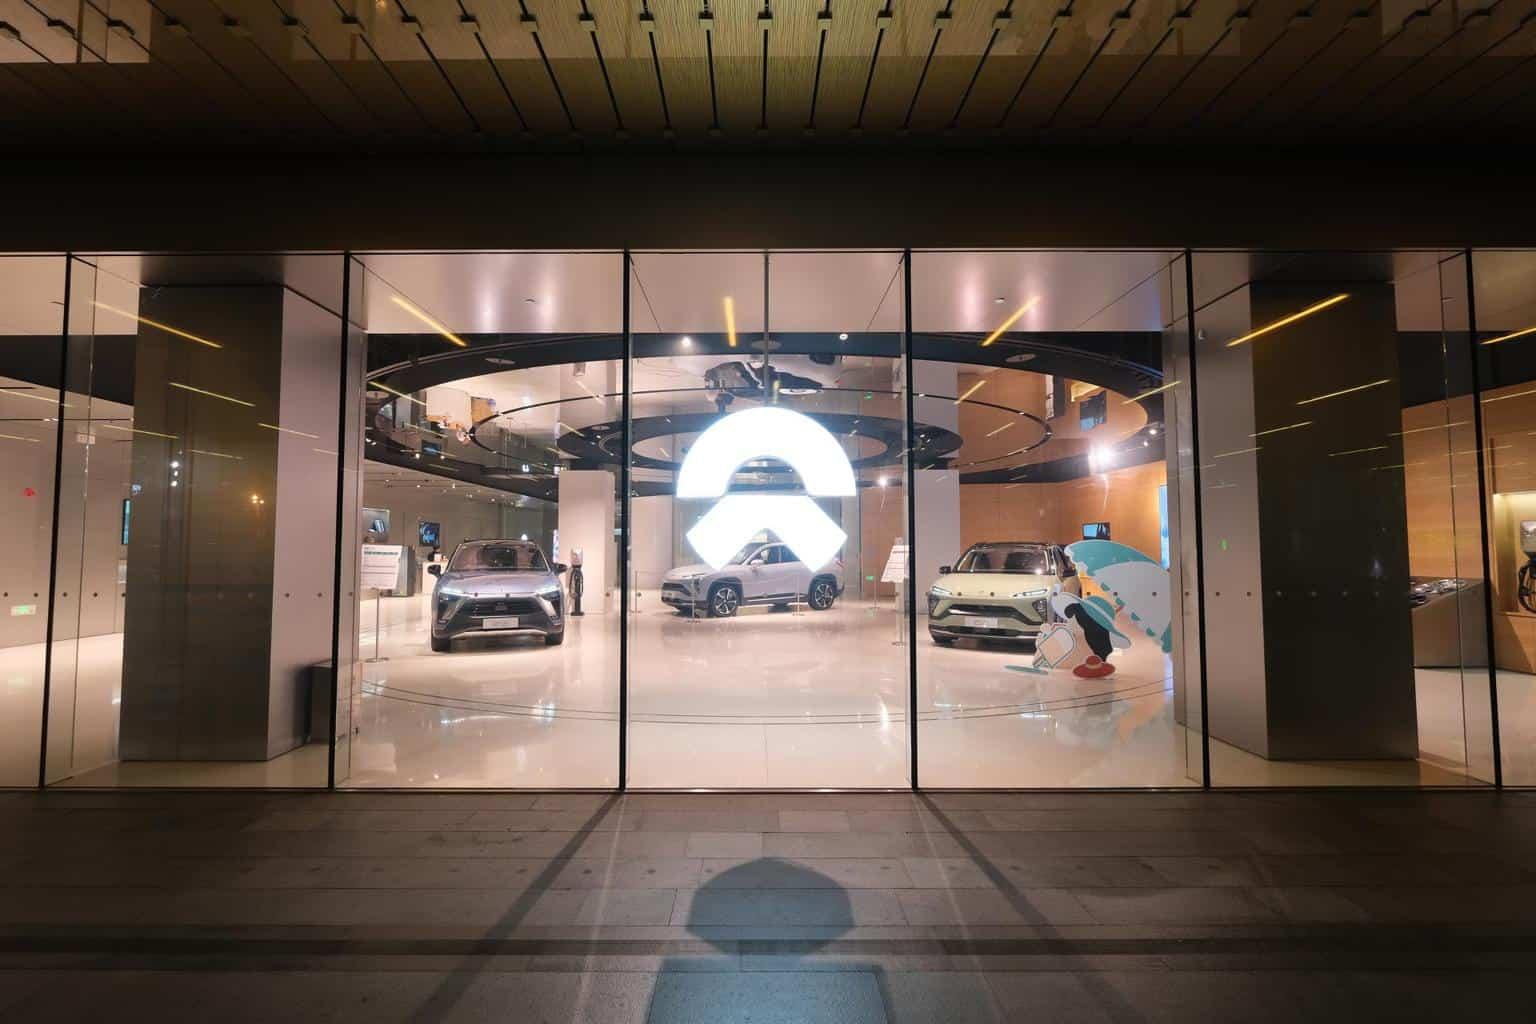 NIO Q3/2020 Bilanz: hohe Bargeldreserven, neues E-Auto & starkes Wachstum